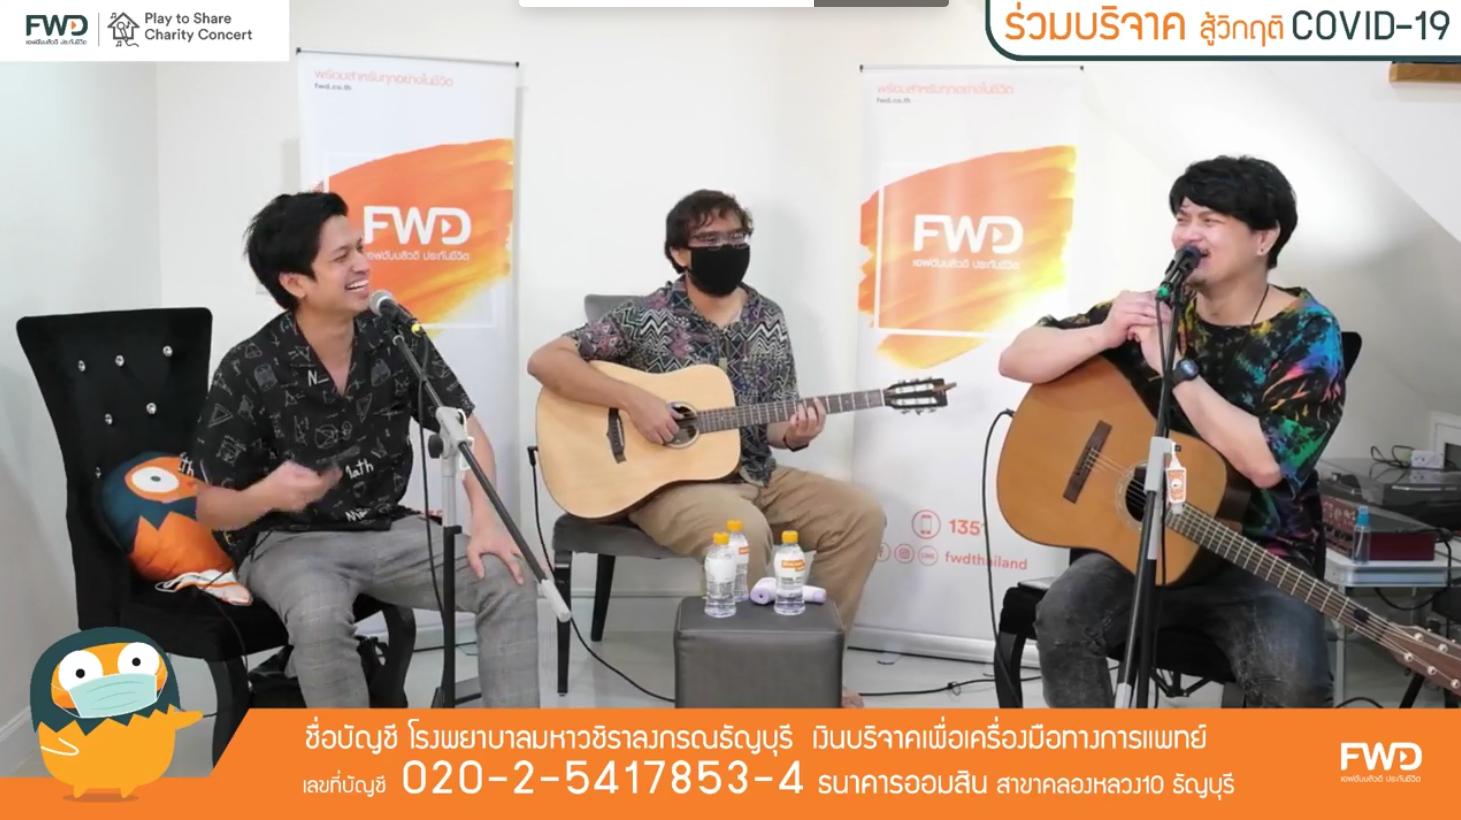 "FWD  จับมือ etset'er และ Zeal จัดคอนเสิร์ตออนไลน์ ""FWD Play to Share"" ระดมทุนเพื่อช่วยเหลือผู้ป่วยโควิด-19"